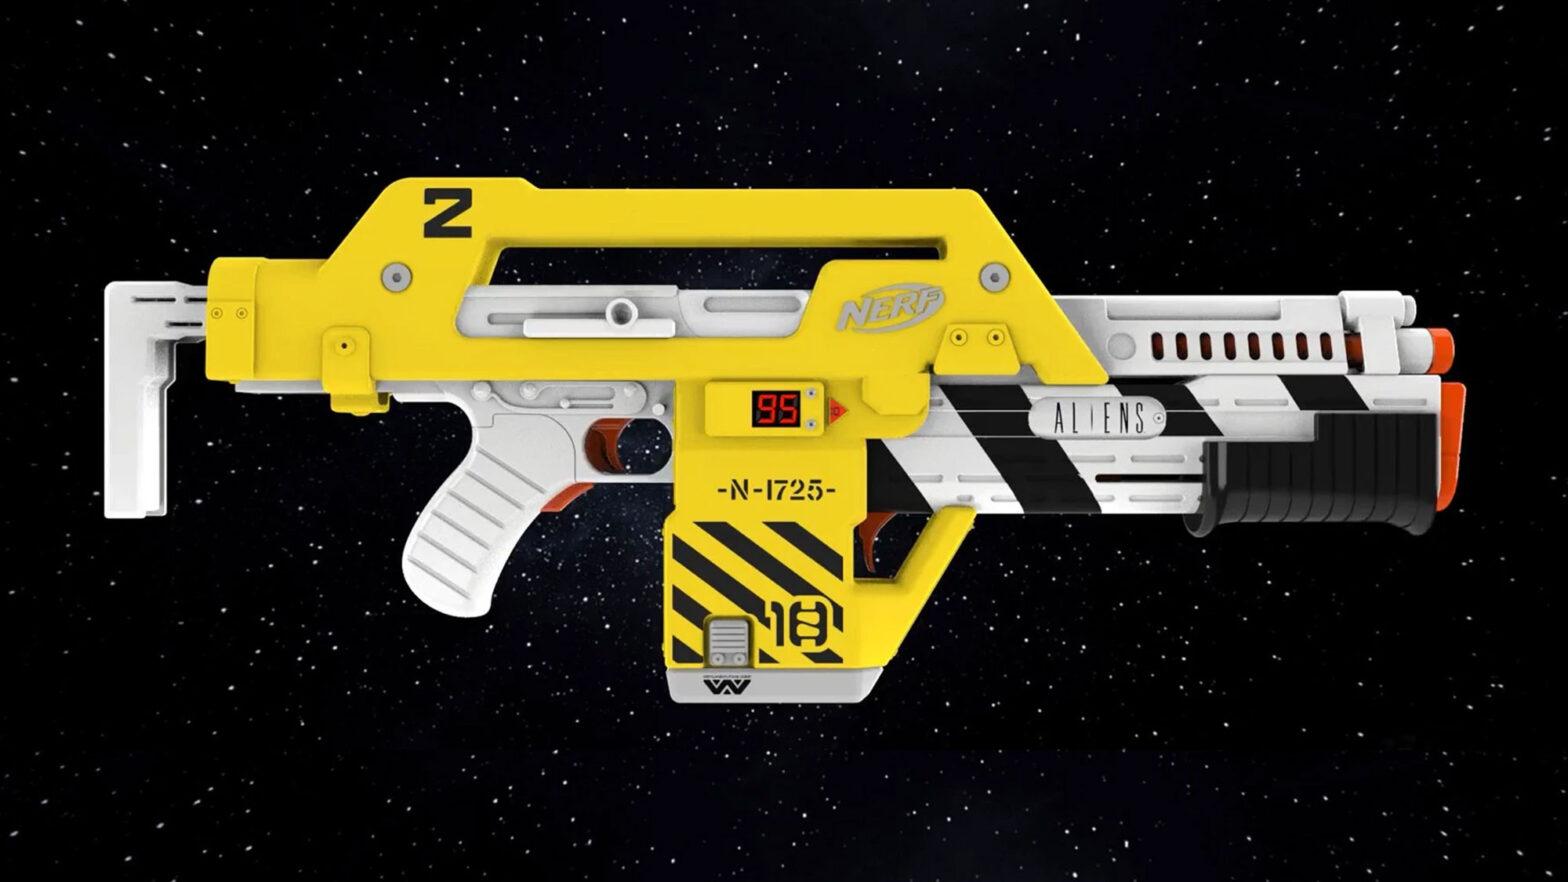 Hasbro NERF LMTD Aliens M41-A Blaster